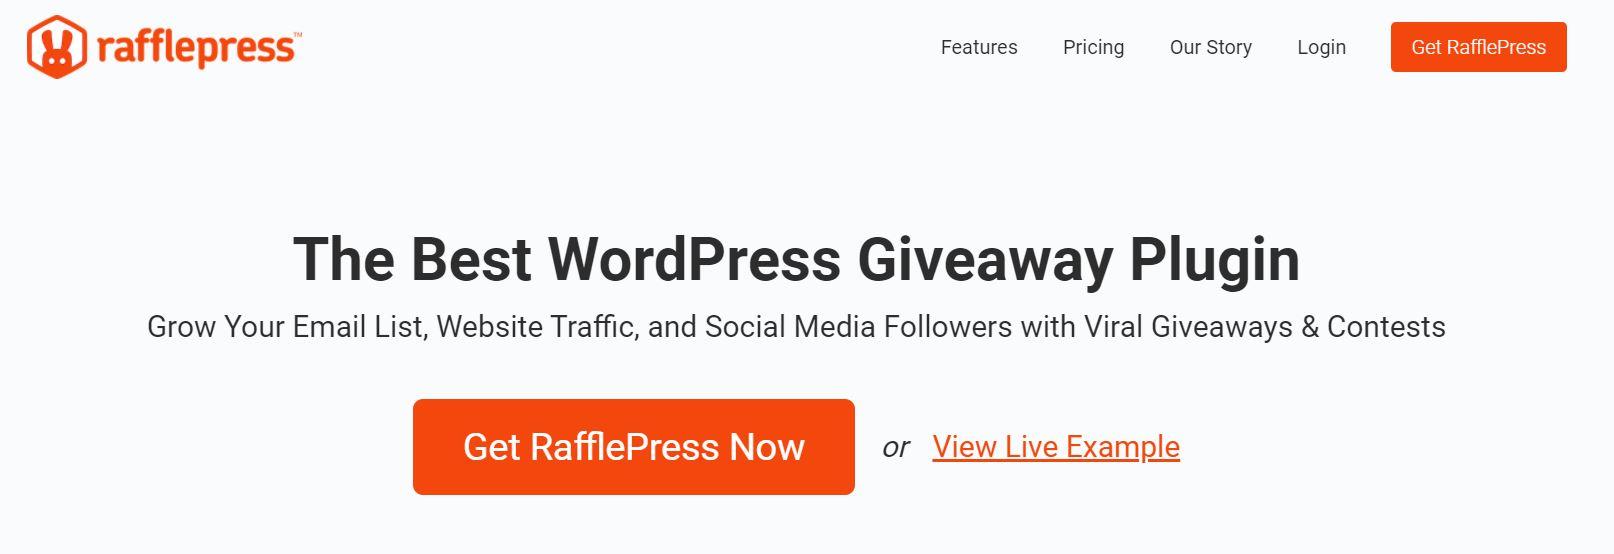 The RafflePress homepage